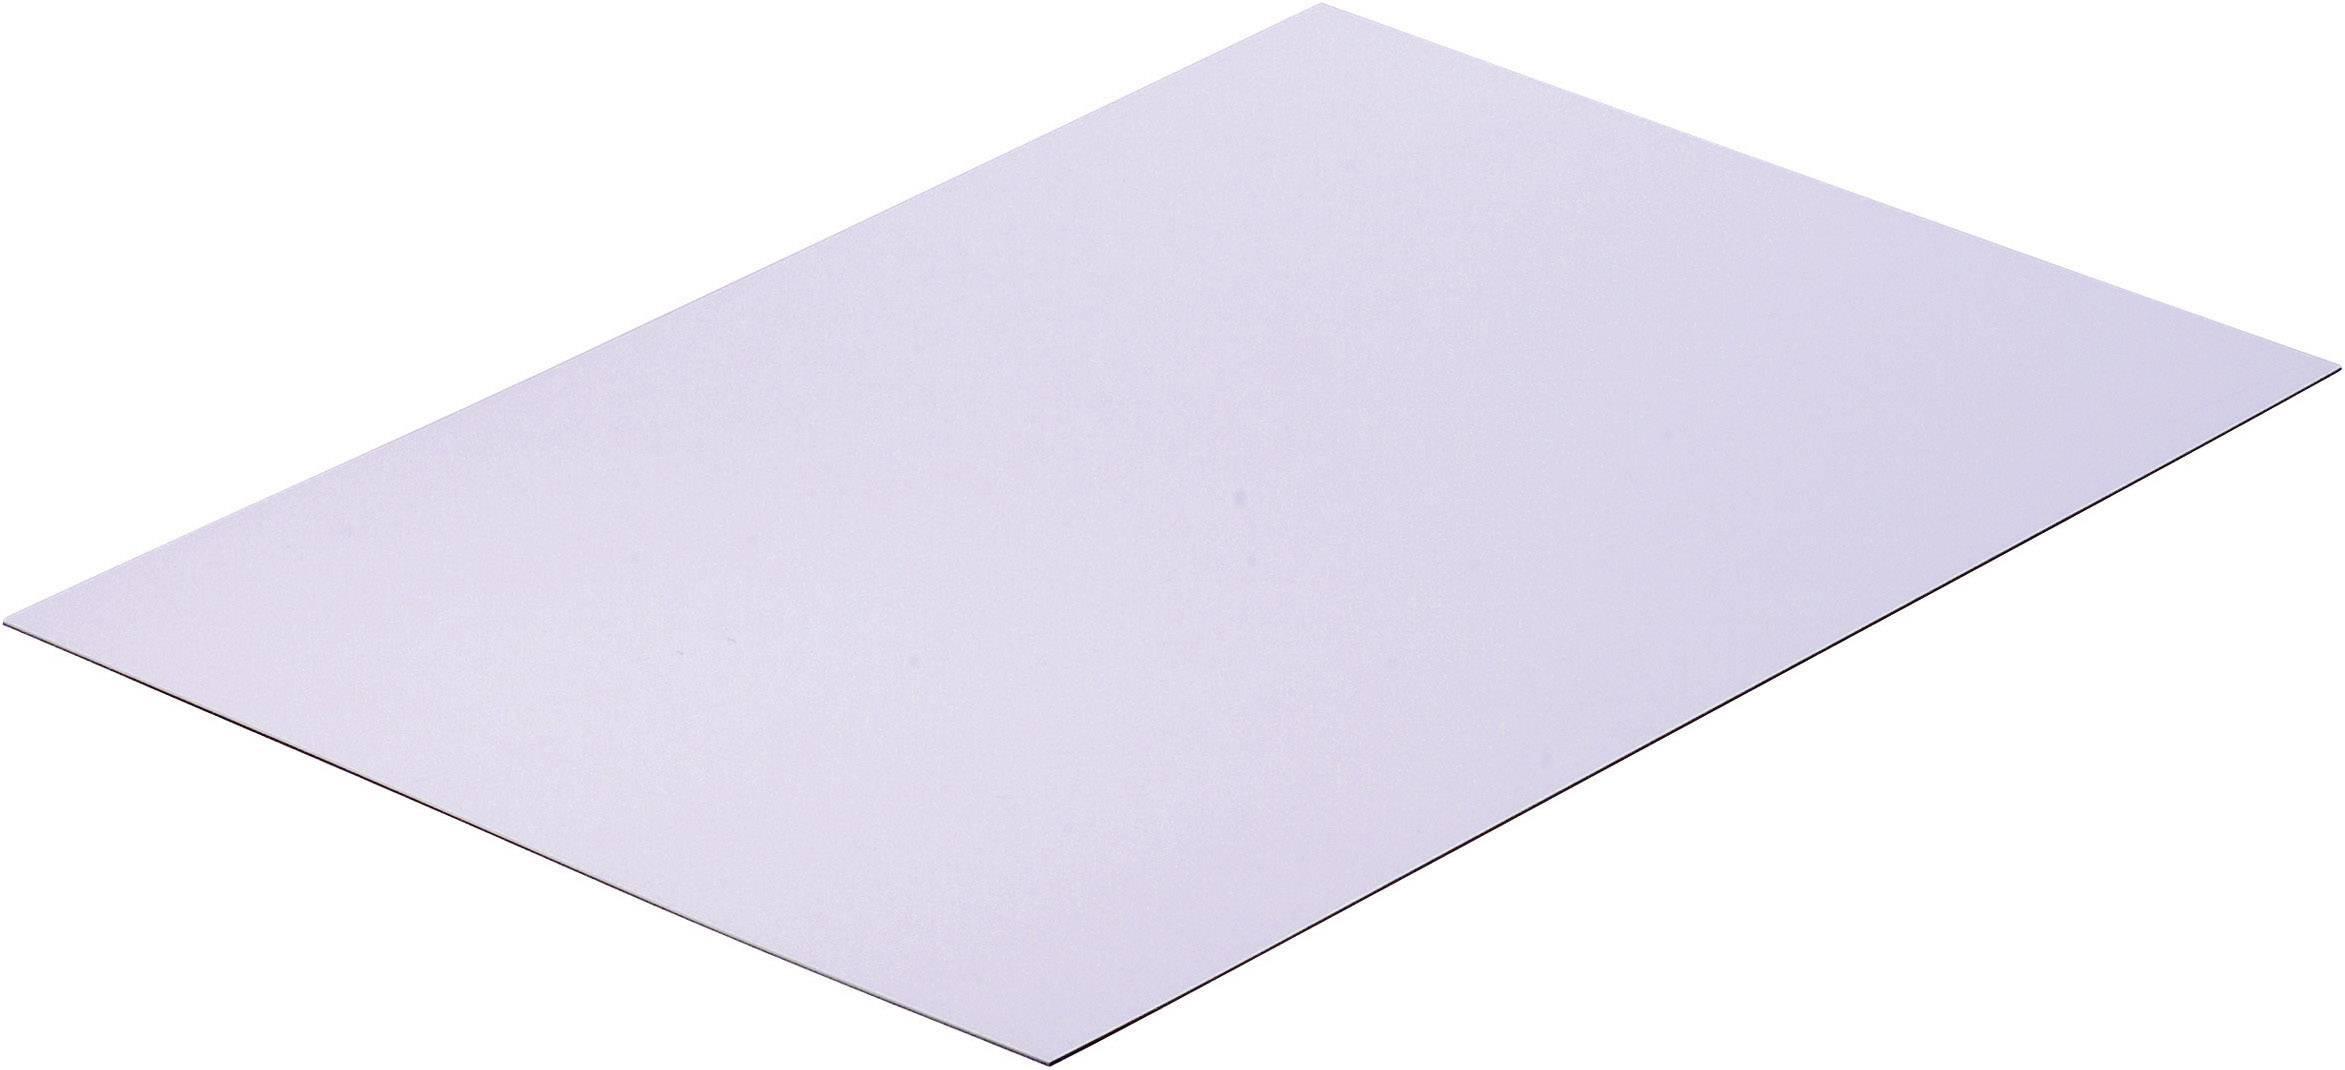 Polystyrenová deska bílá Modelcraft, 330 x 230 x 5 mm